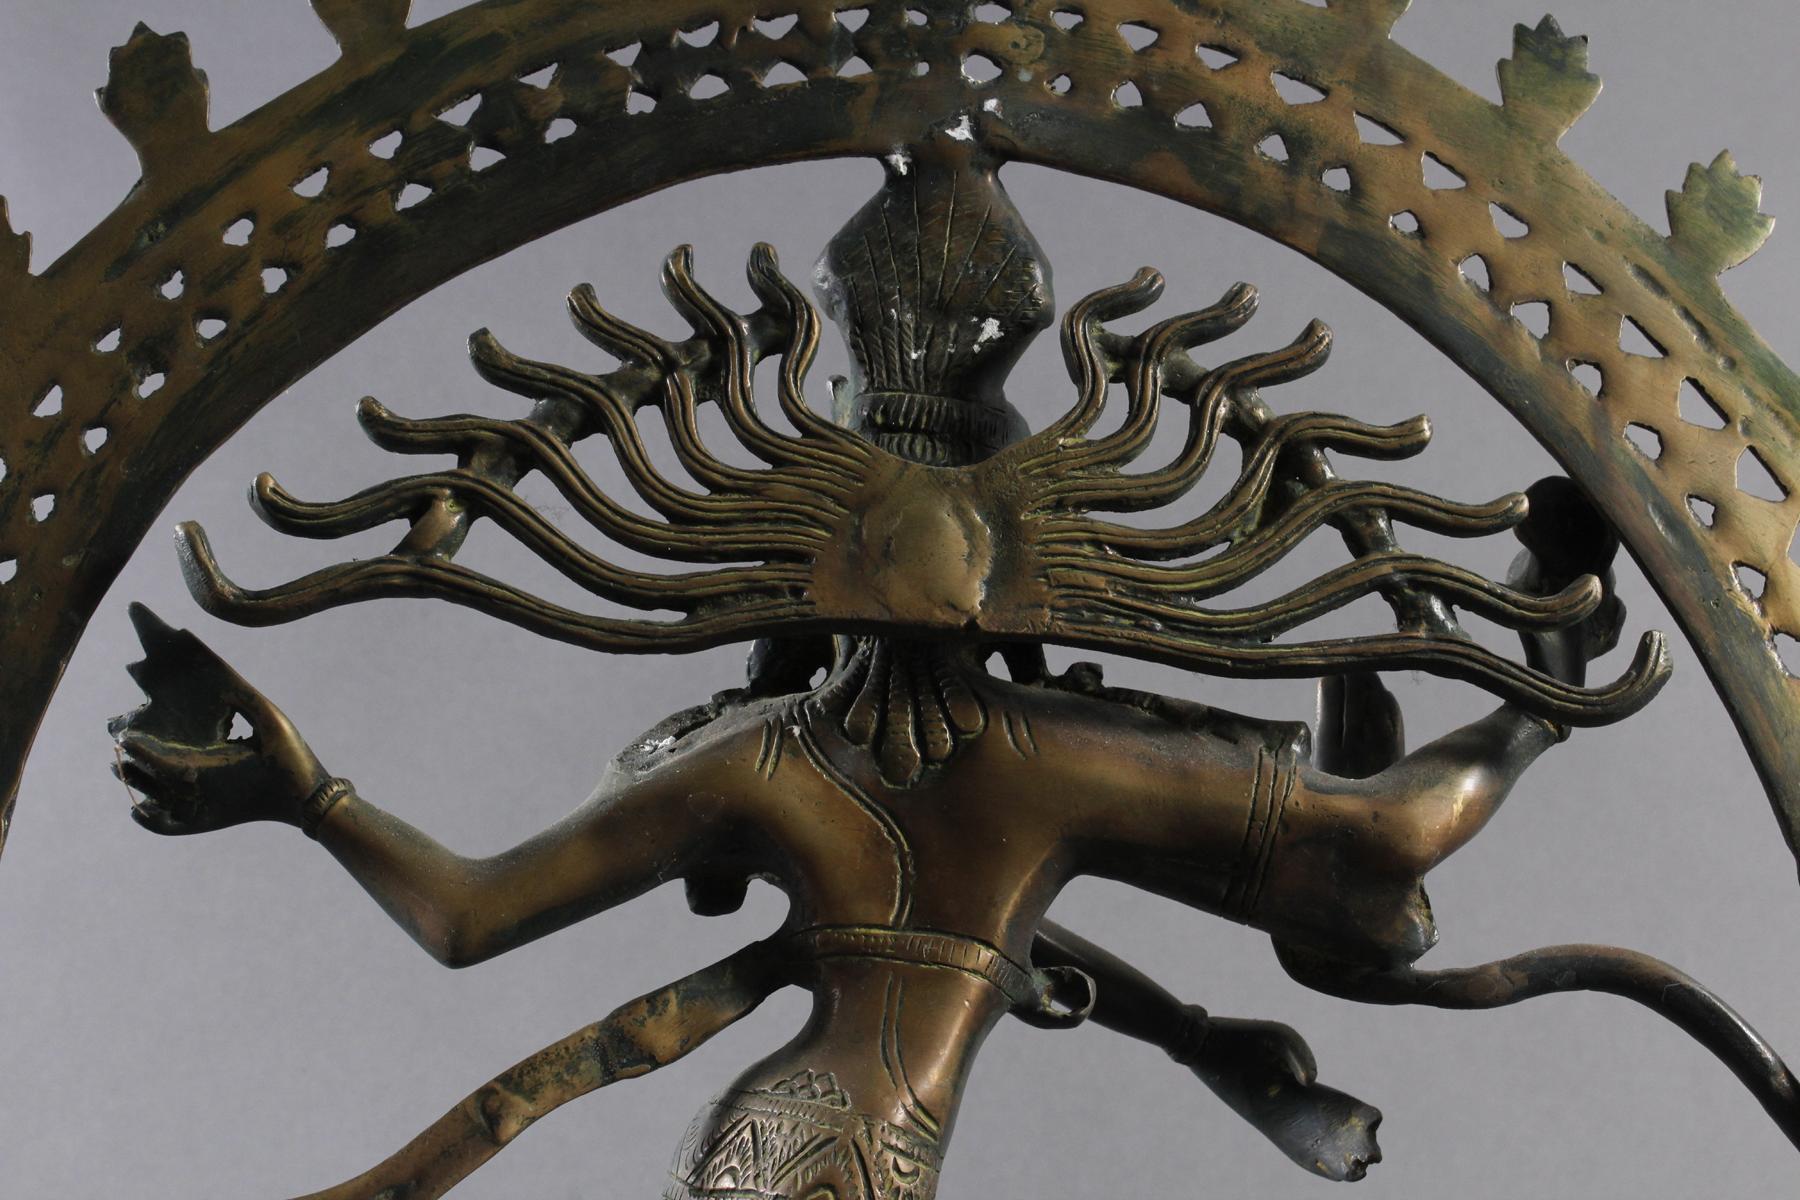 Nataraja Shiva im Flammenrad, Indien, 19. / 20. Jahrhundert-5